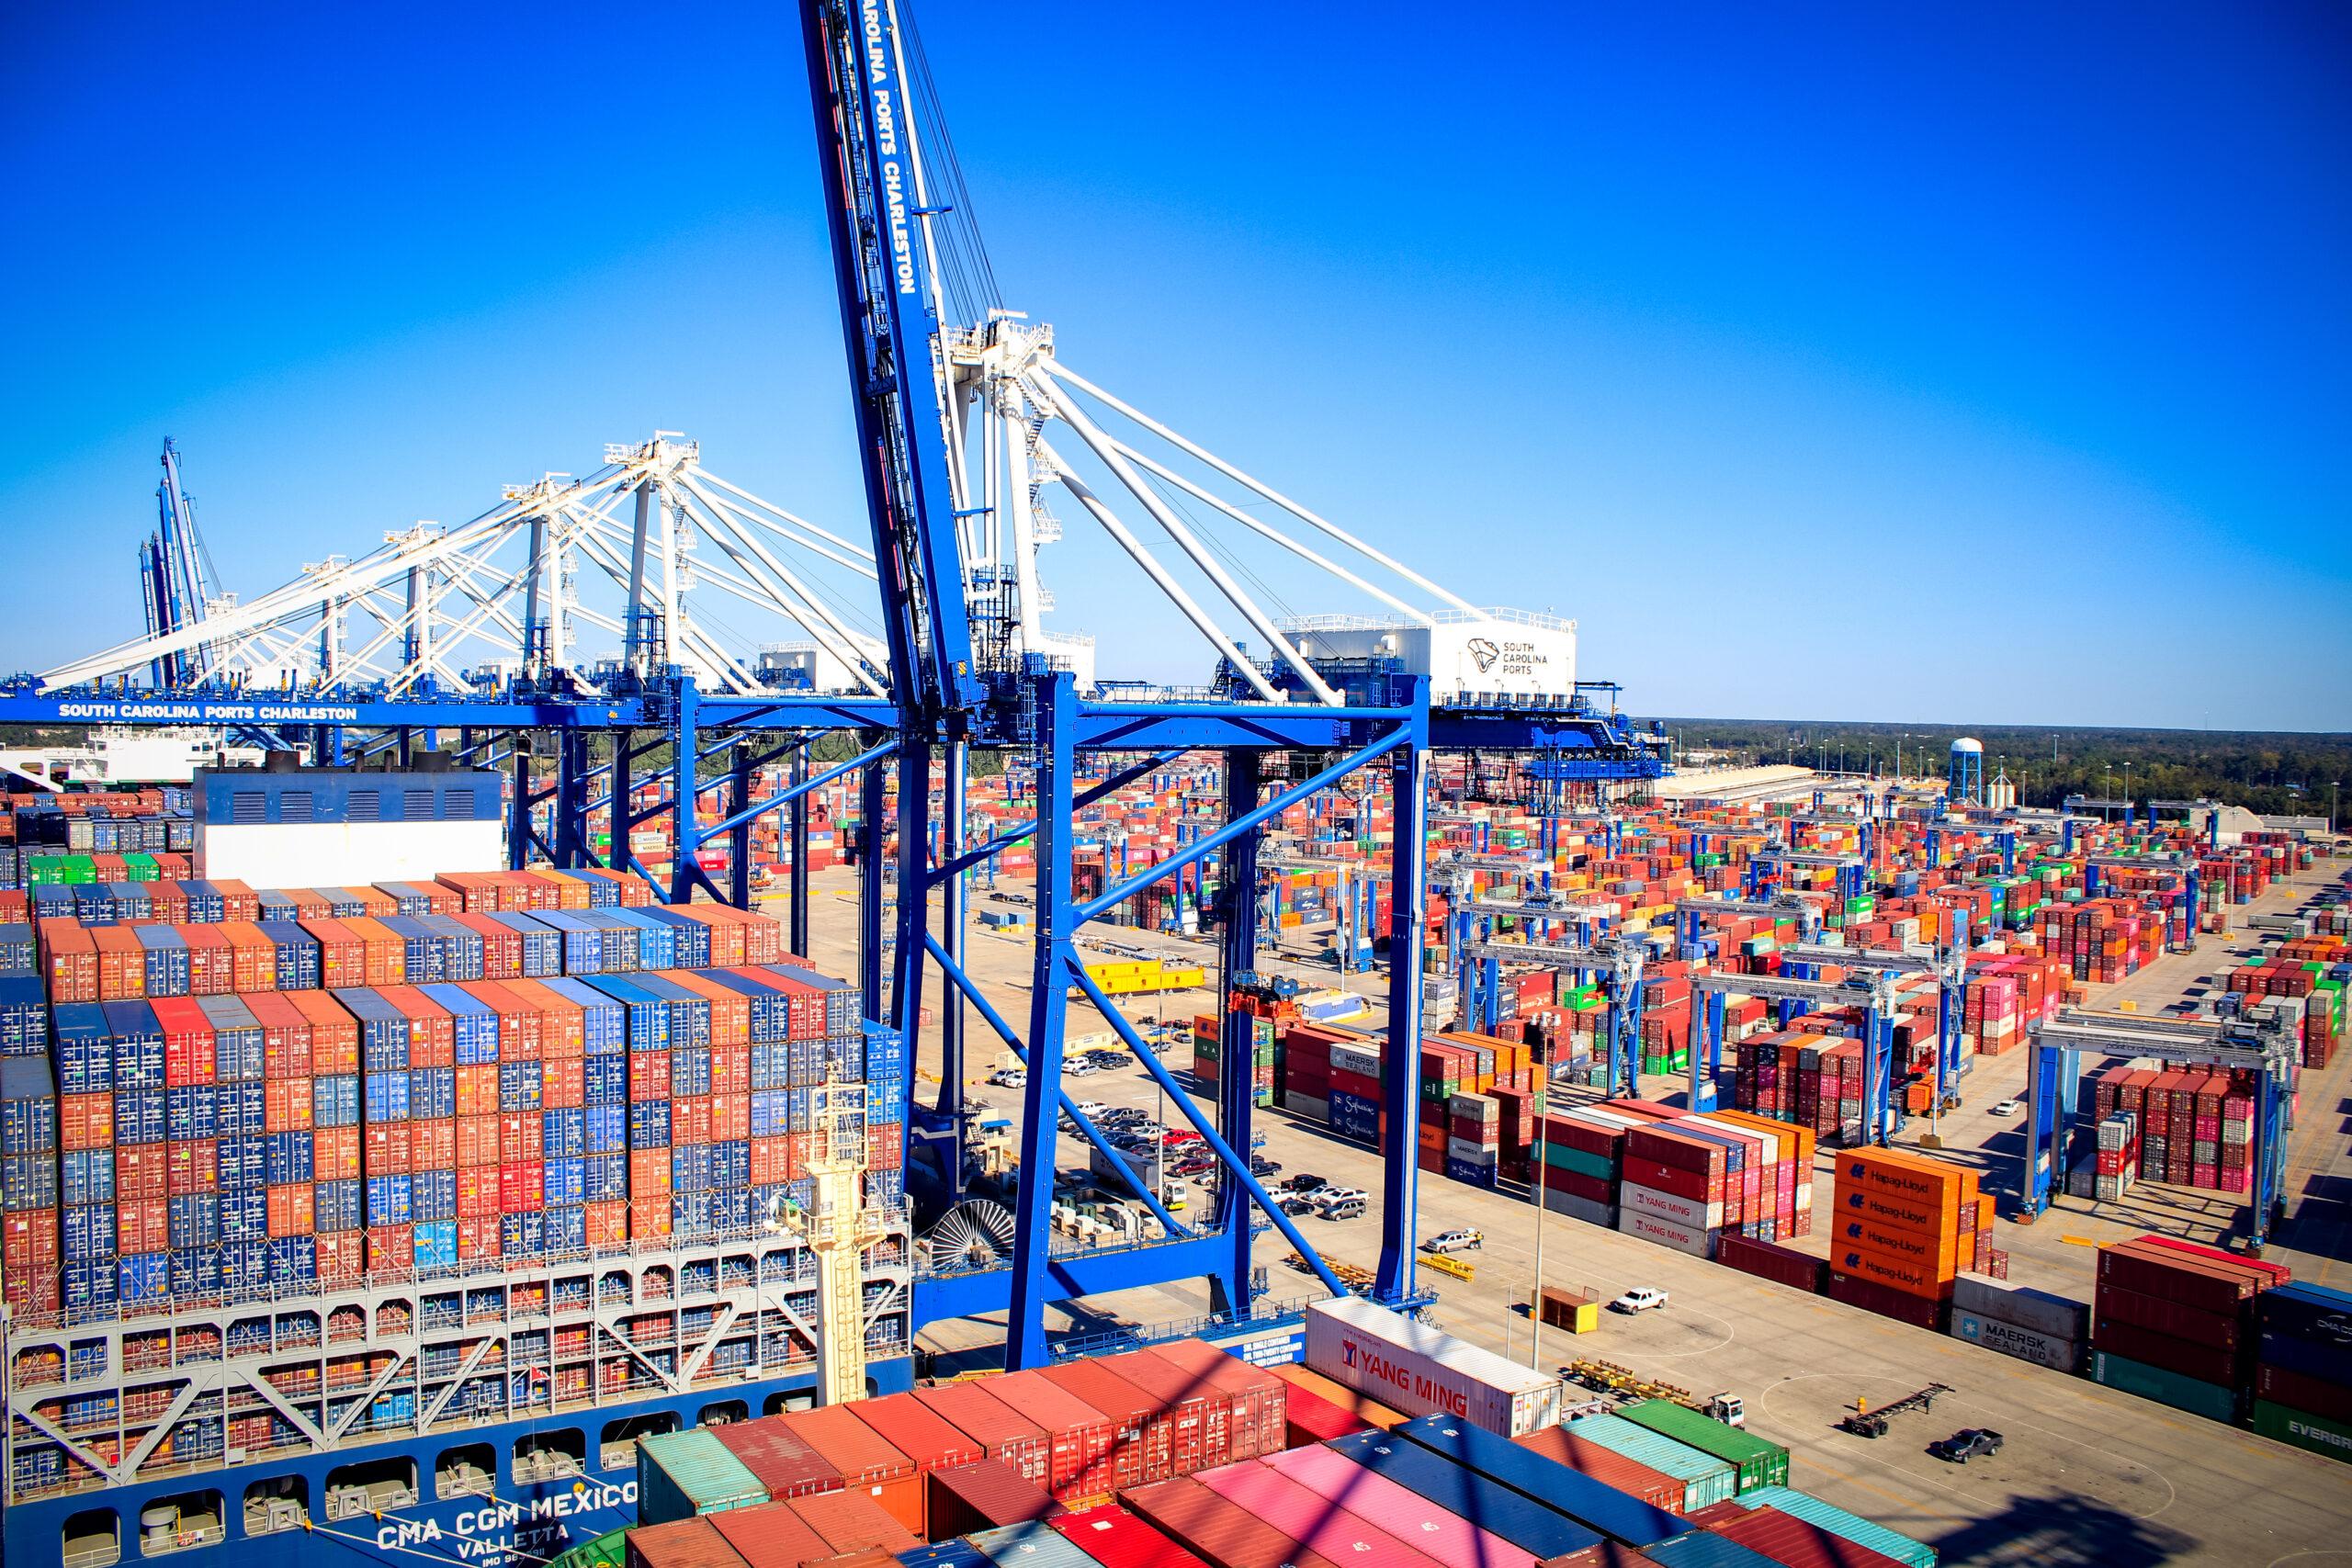 Wando Welch Terminal viewed from a crane